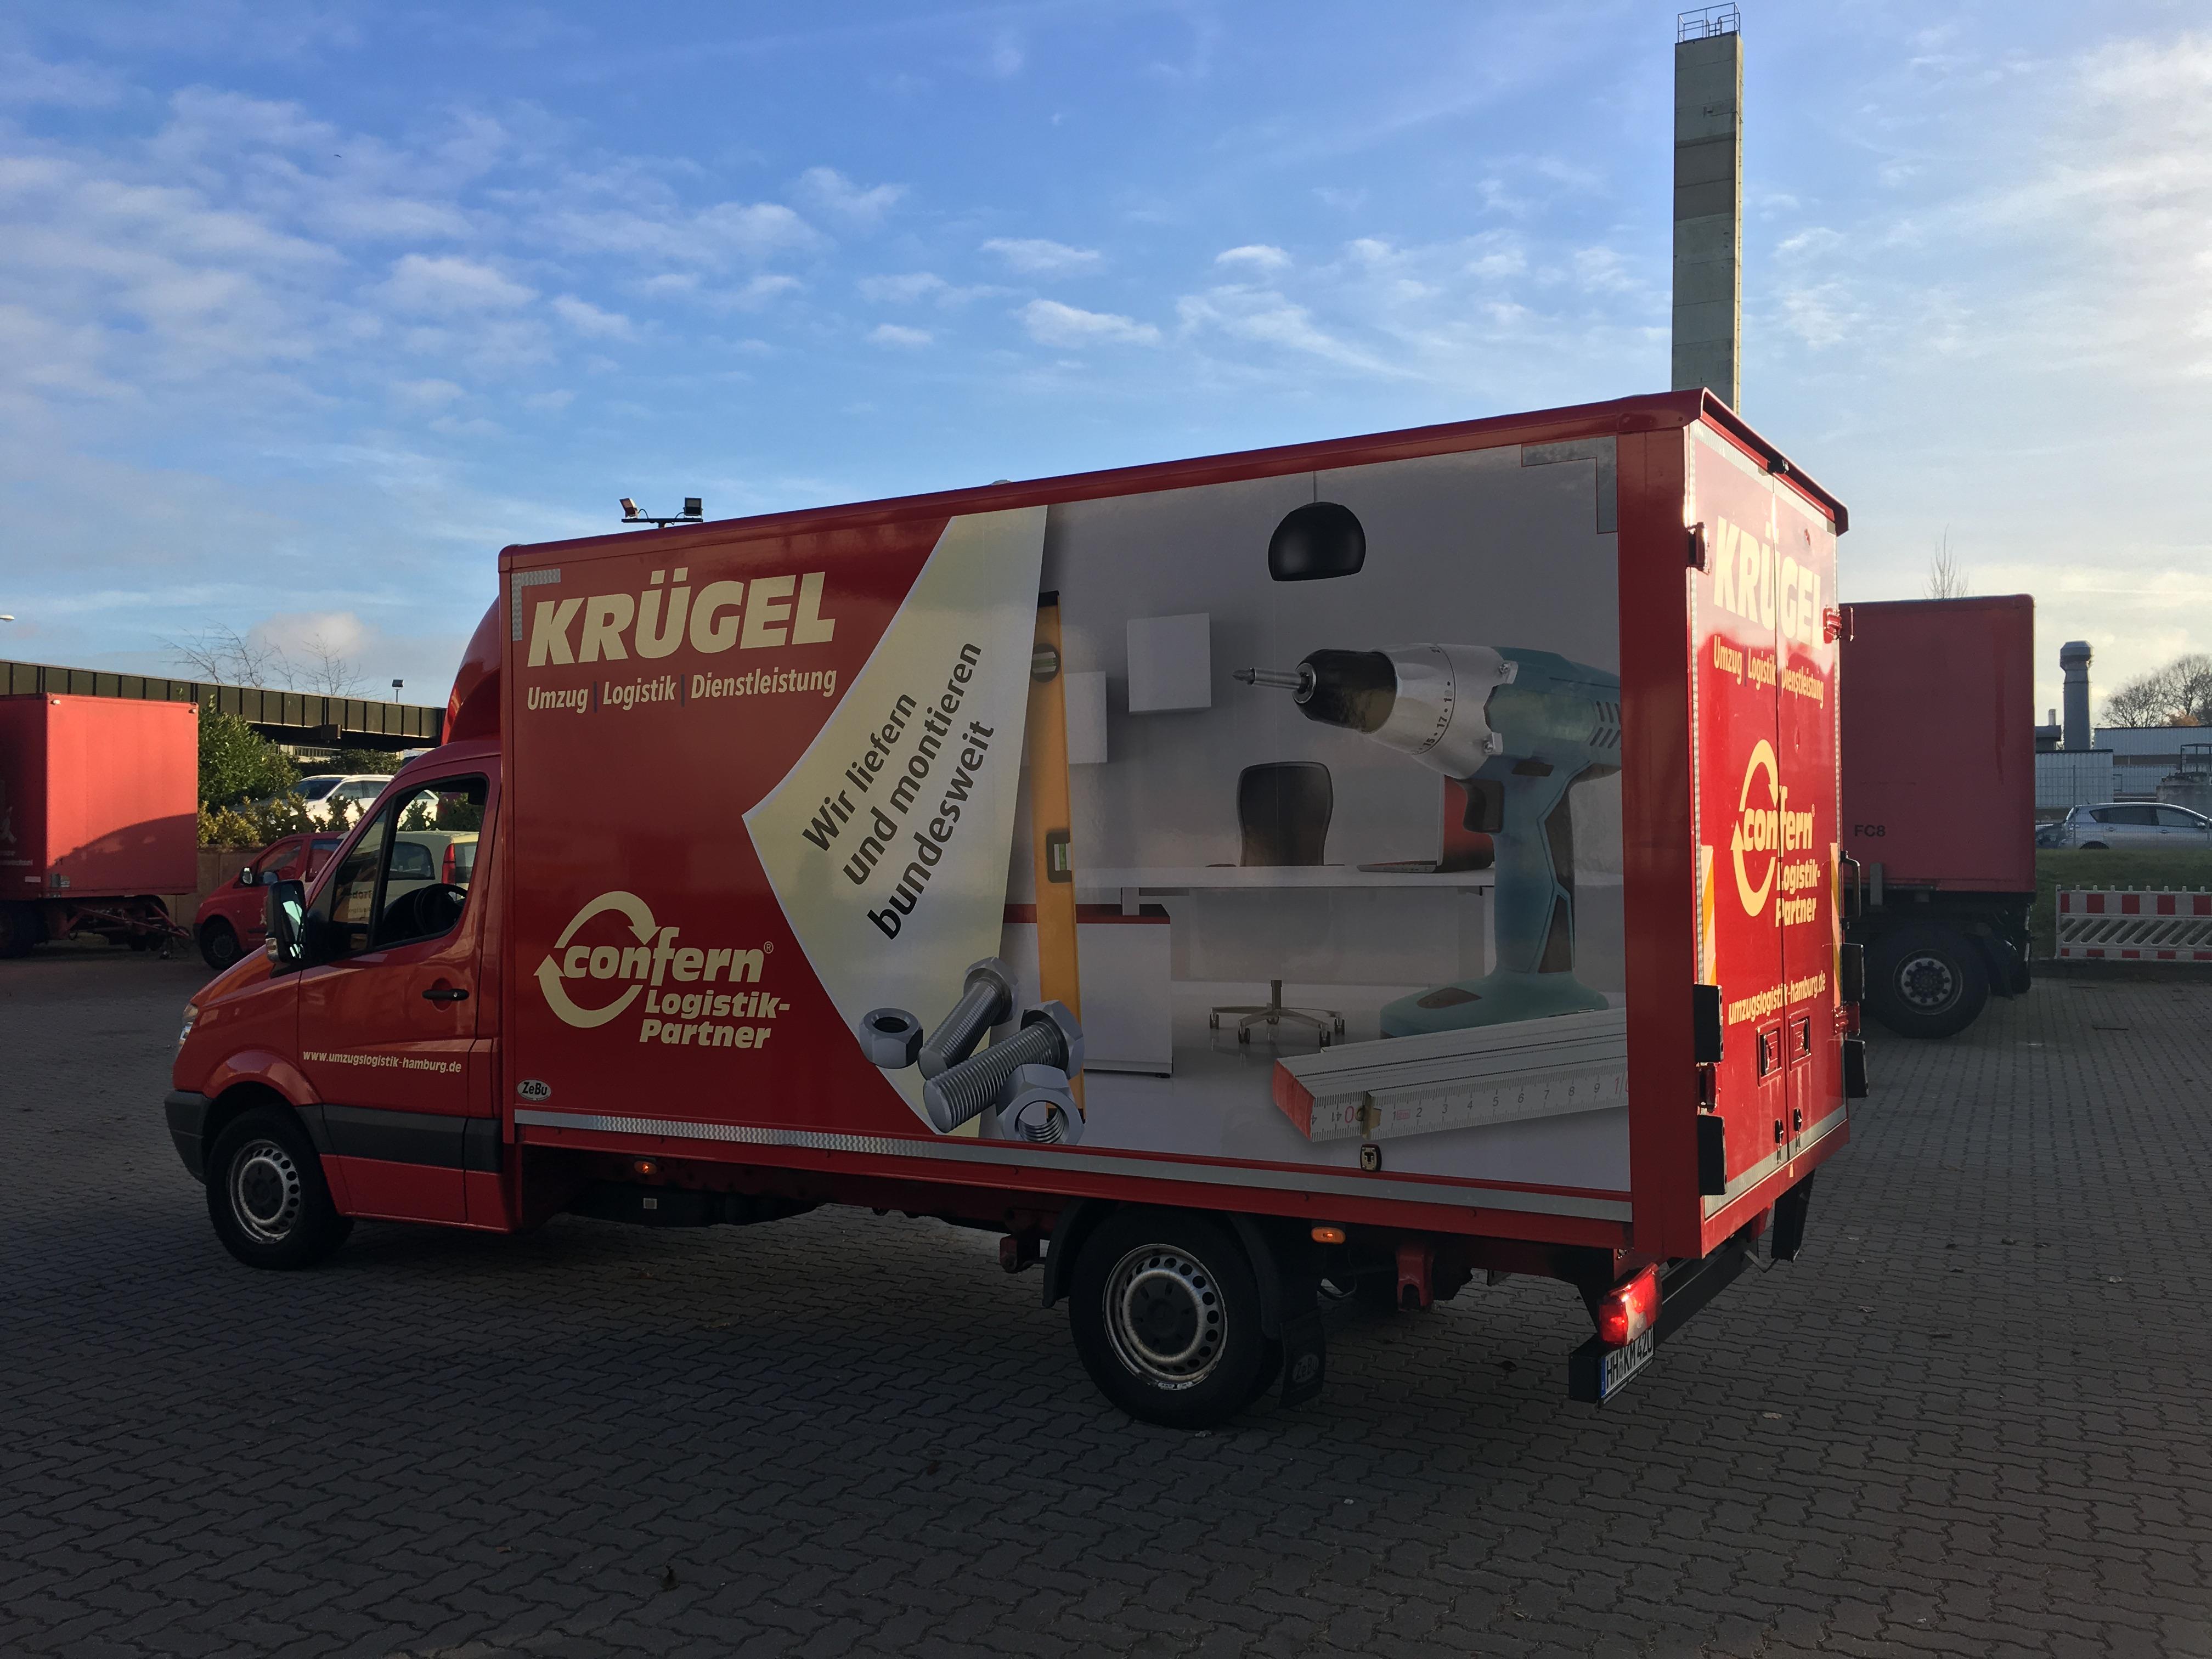 confern Möbeltransportbetriebe GmbH